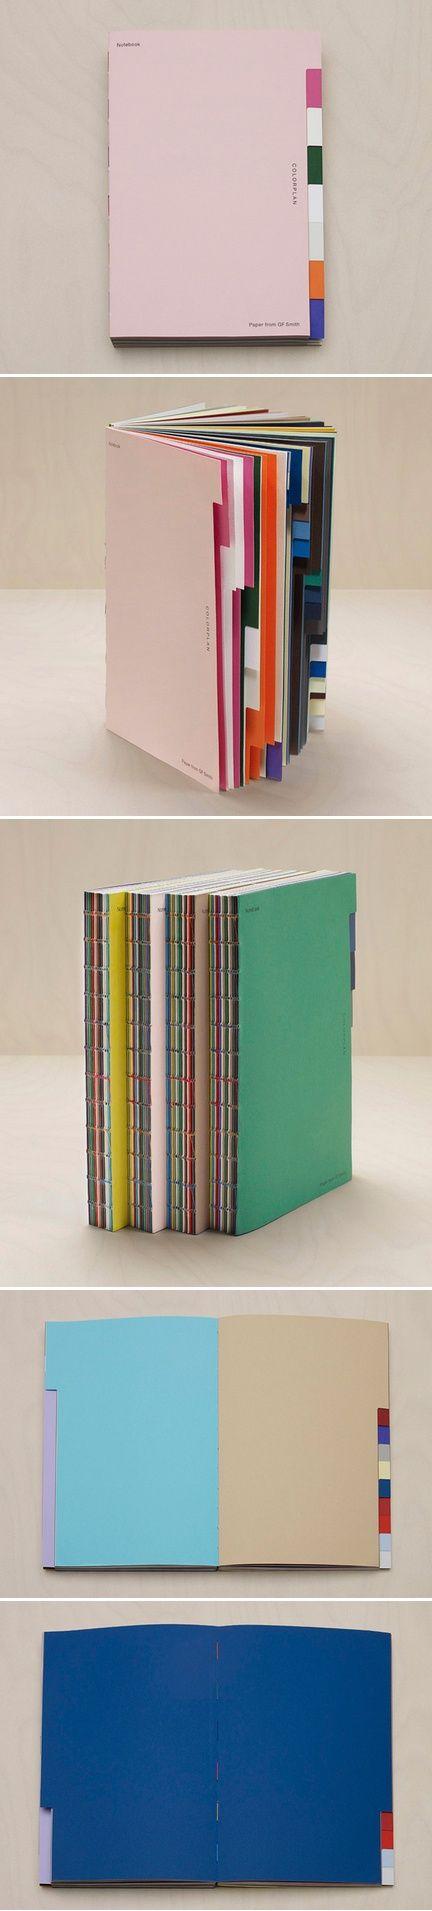 Faconnage Book Design Bookbinding Book Binding